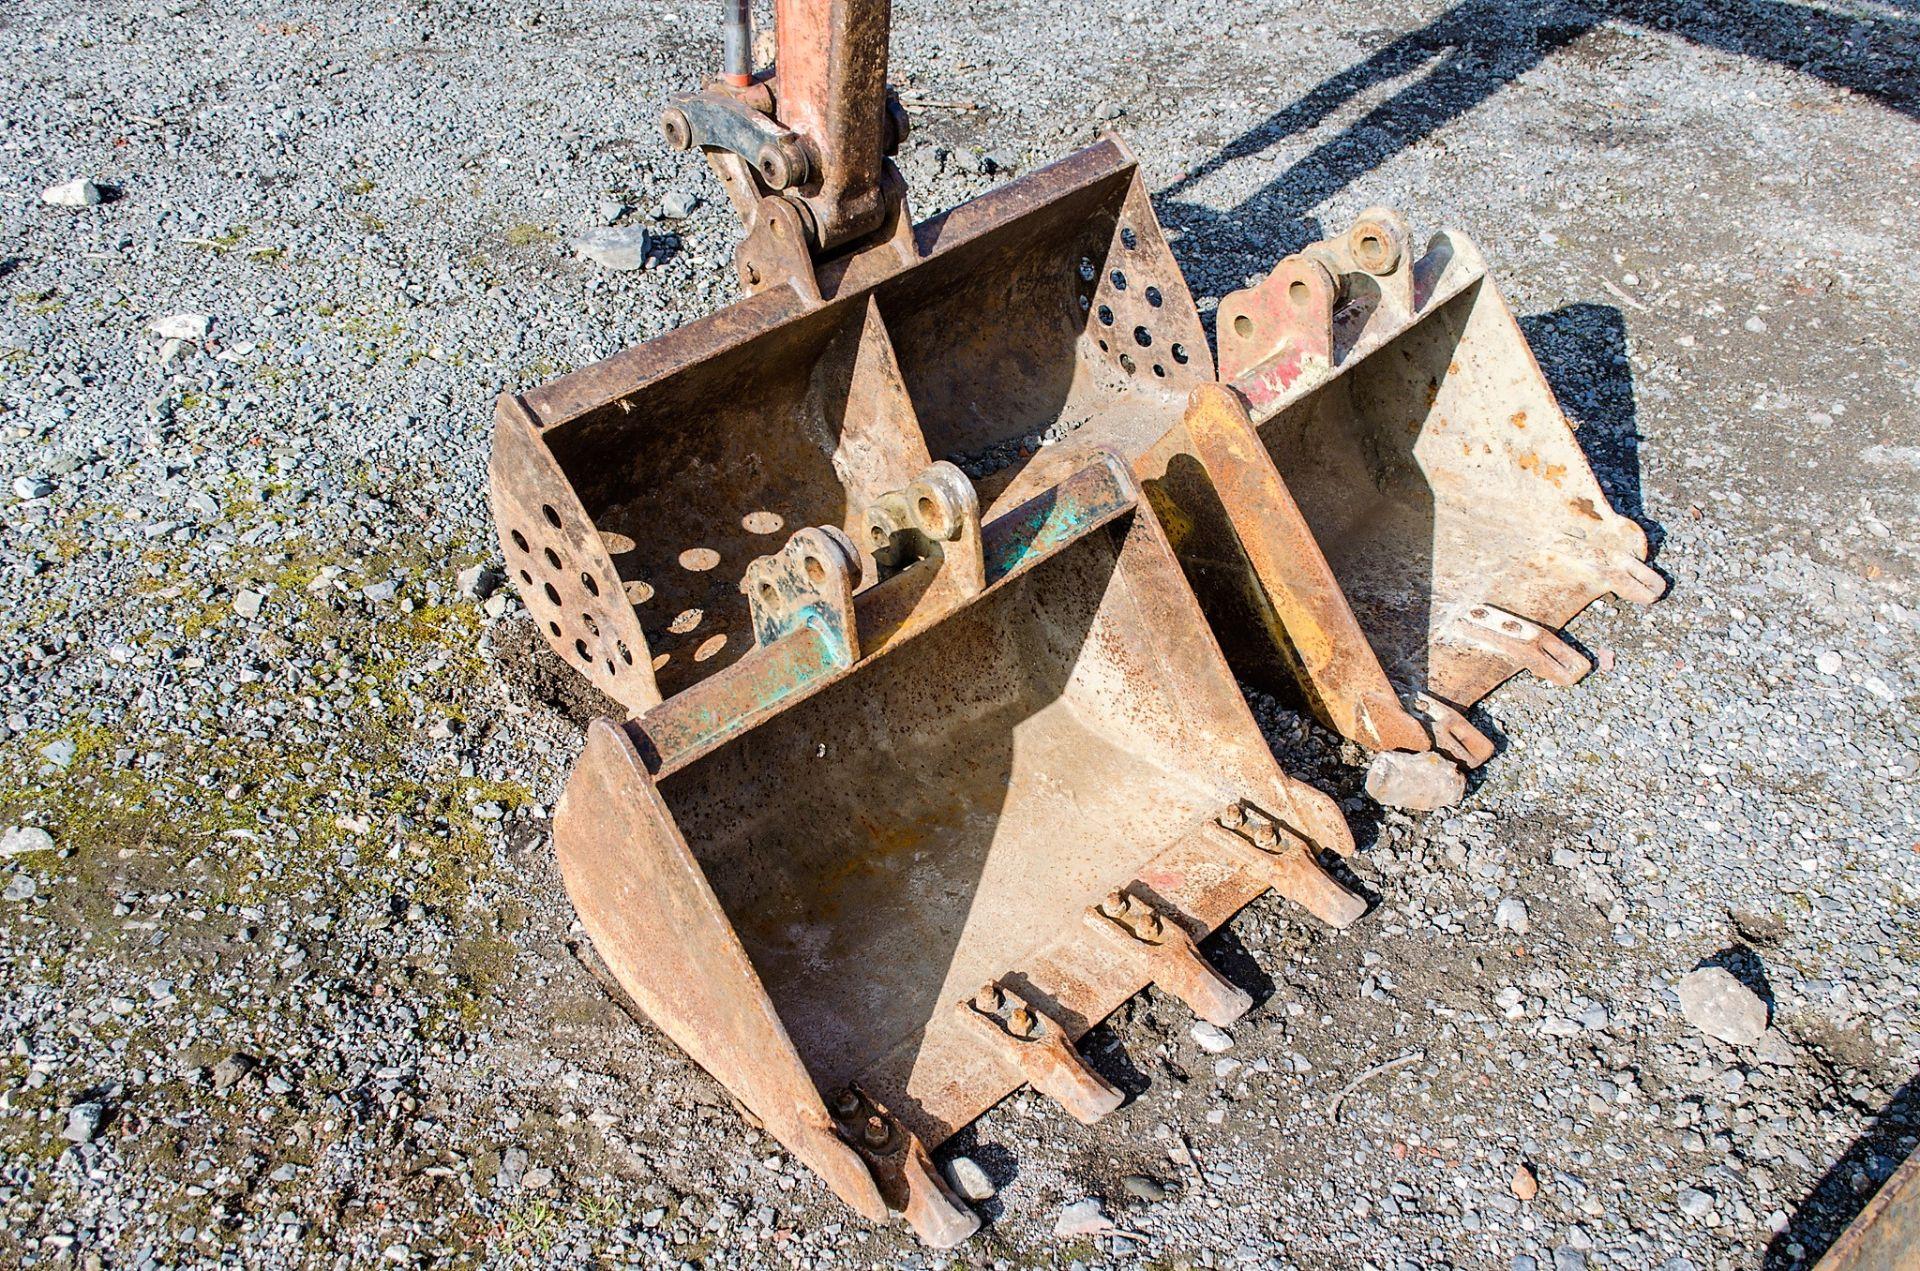 Kubota KX36-3 1.5 tonne rubber tracked mini excavator Year: 2007 S/N: Z077298 Recorded Hours: 4205 - Image 12 of 18